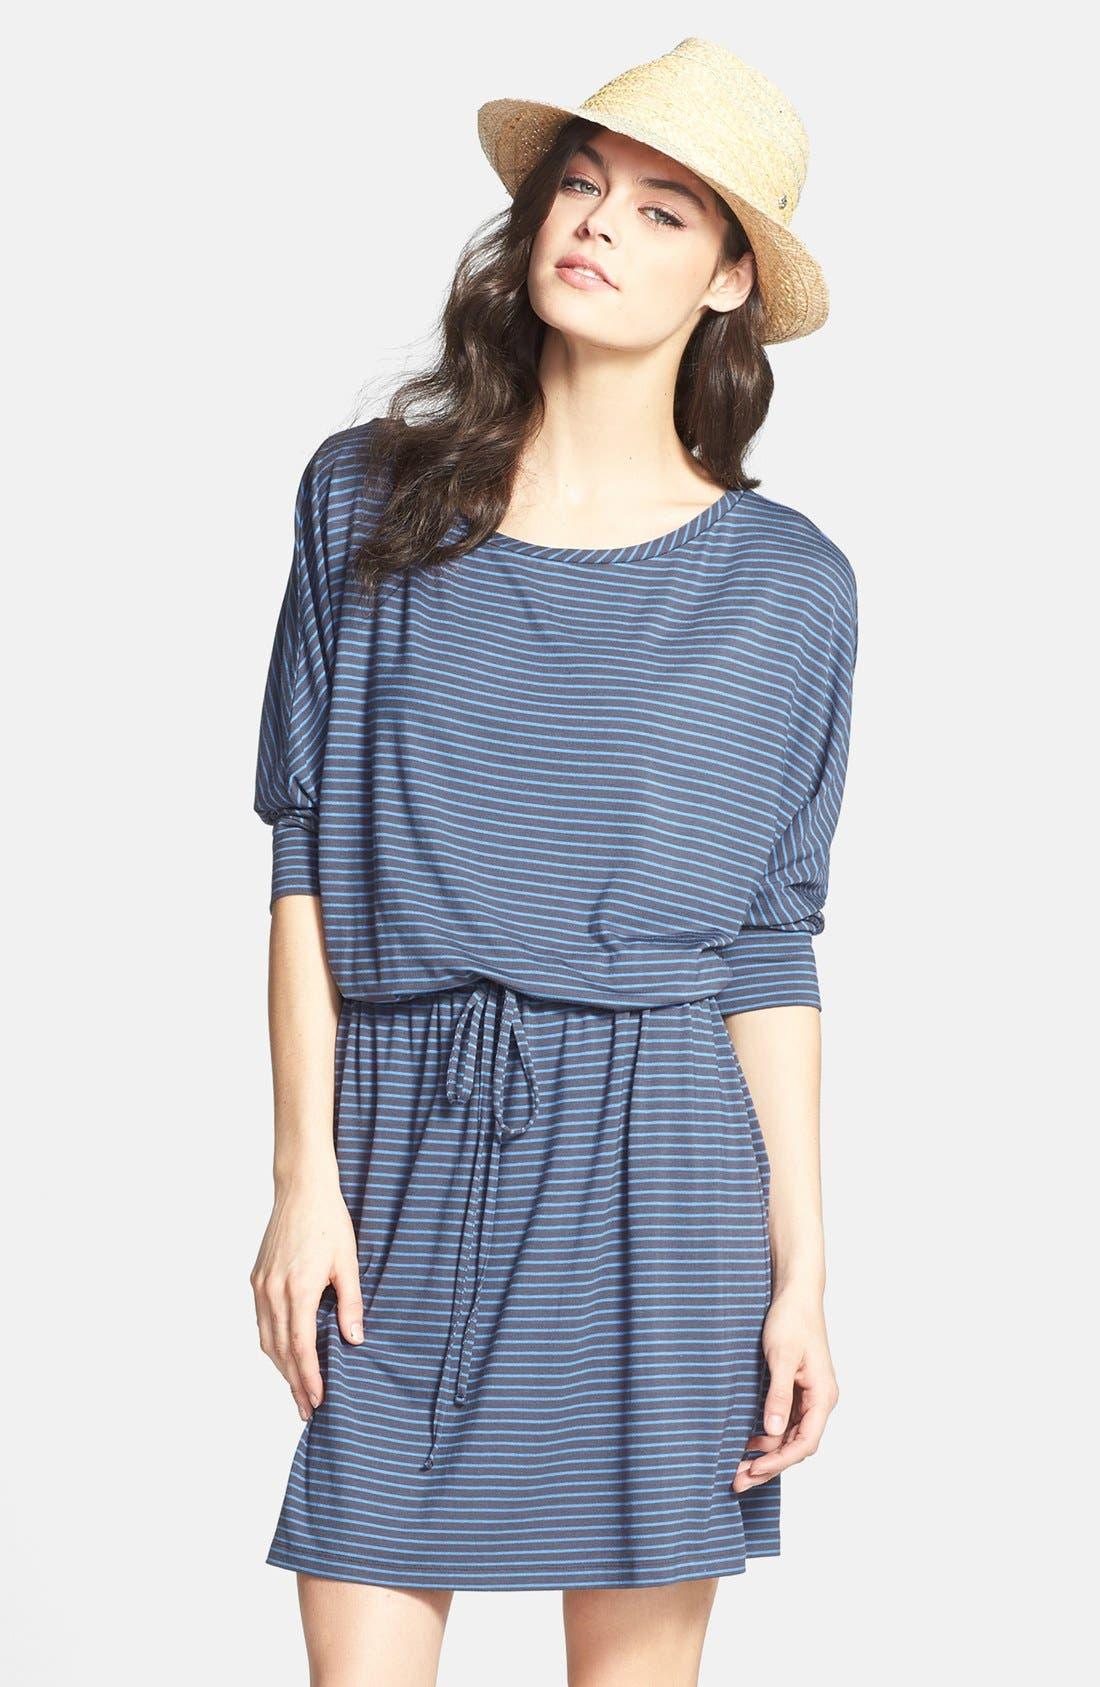 Alternate Image 1 Selected - Caslon® Three Quarter Sleeve Round Neck Stretch Knit Dress (Regular & Petite)